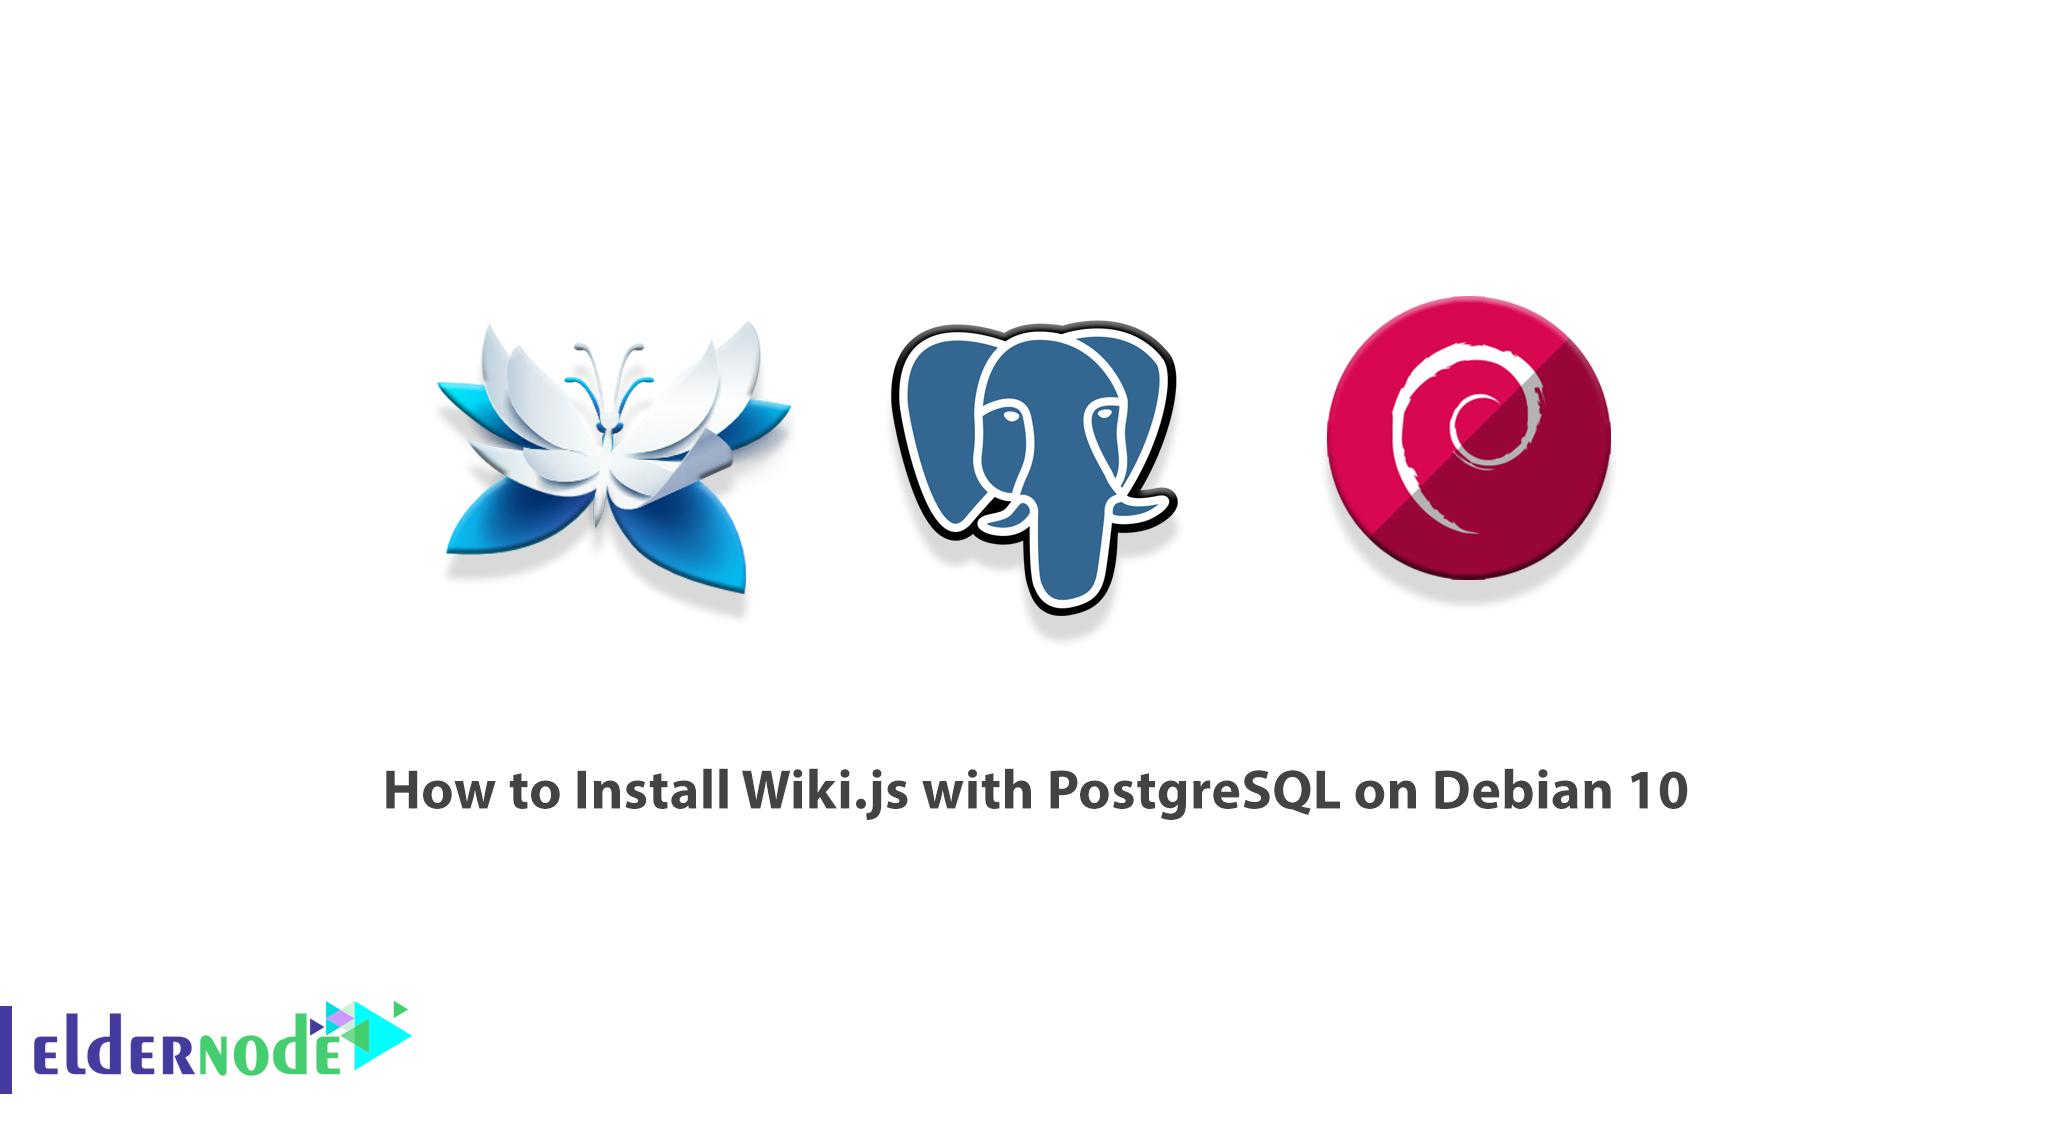 How to Install Wiki.js with PostgreSQL on Debian 10